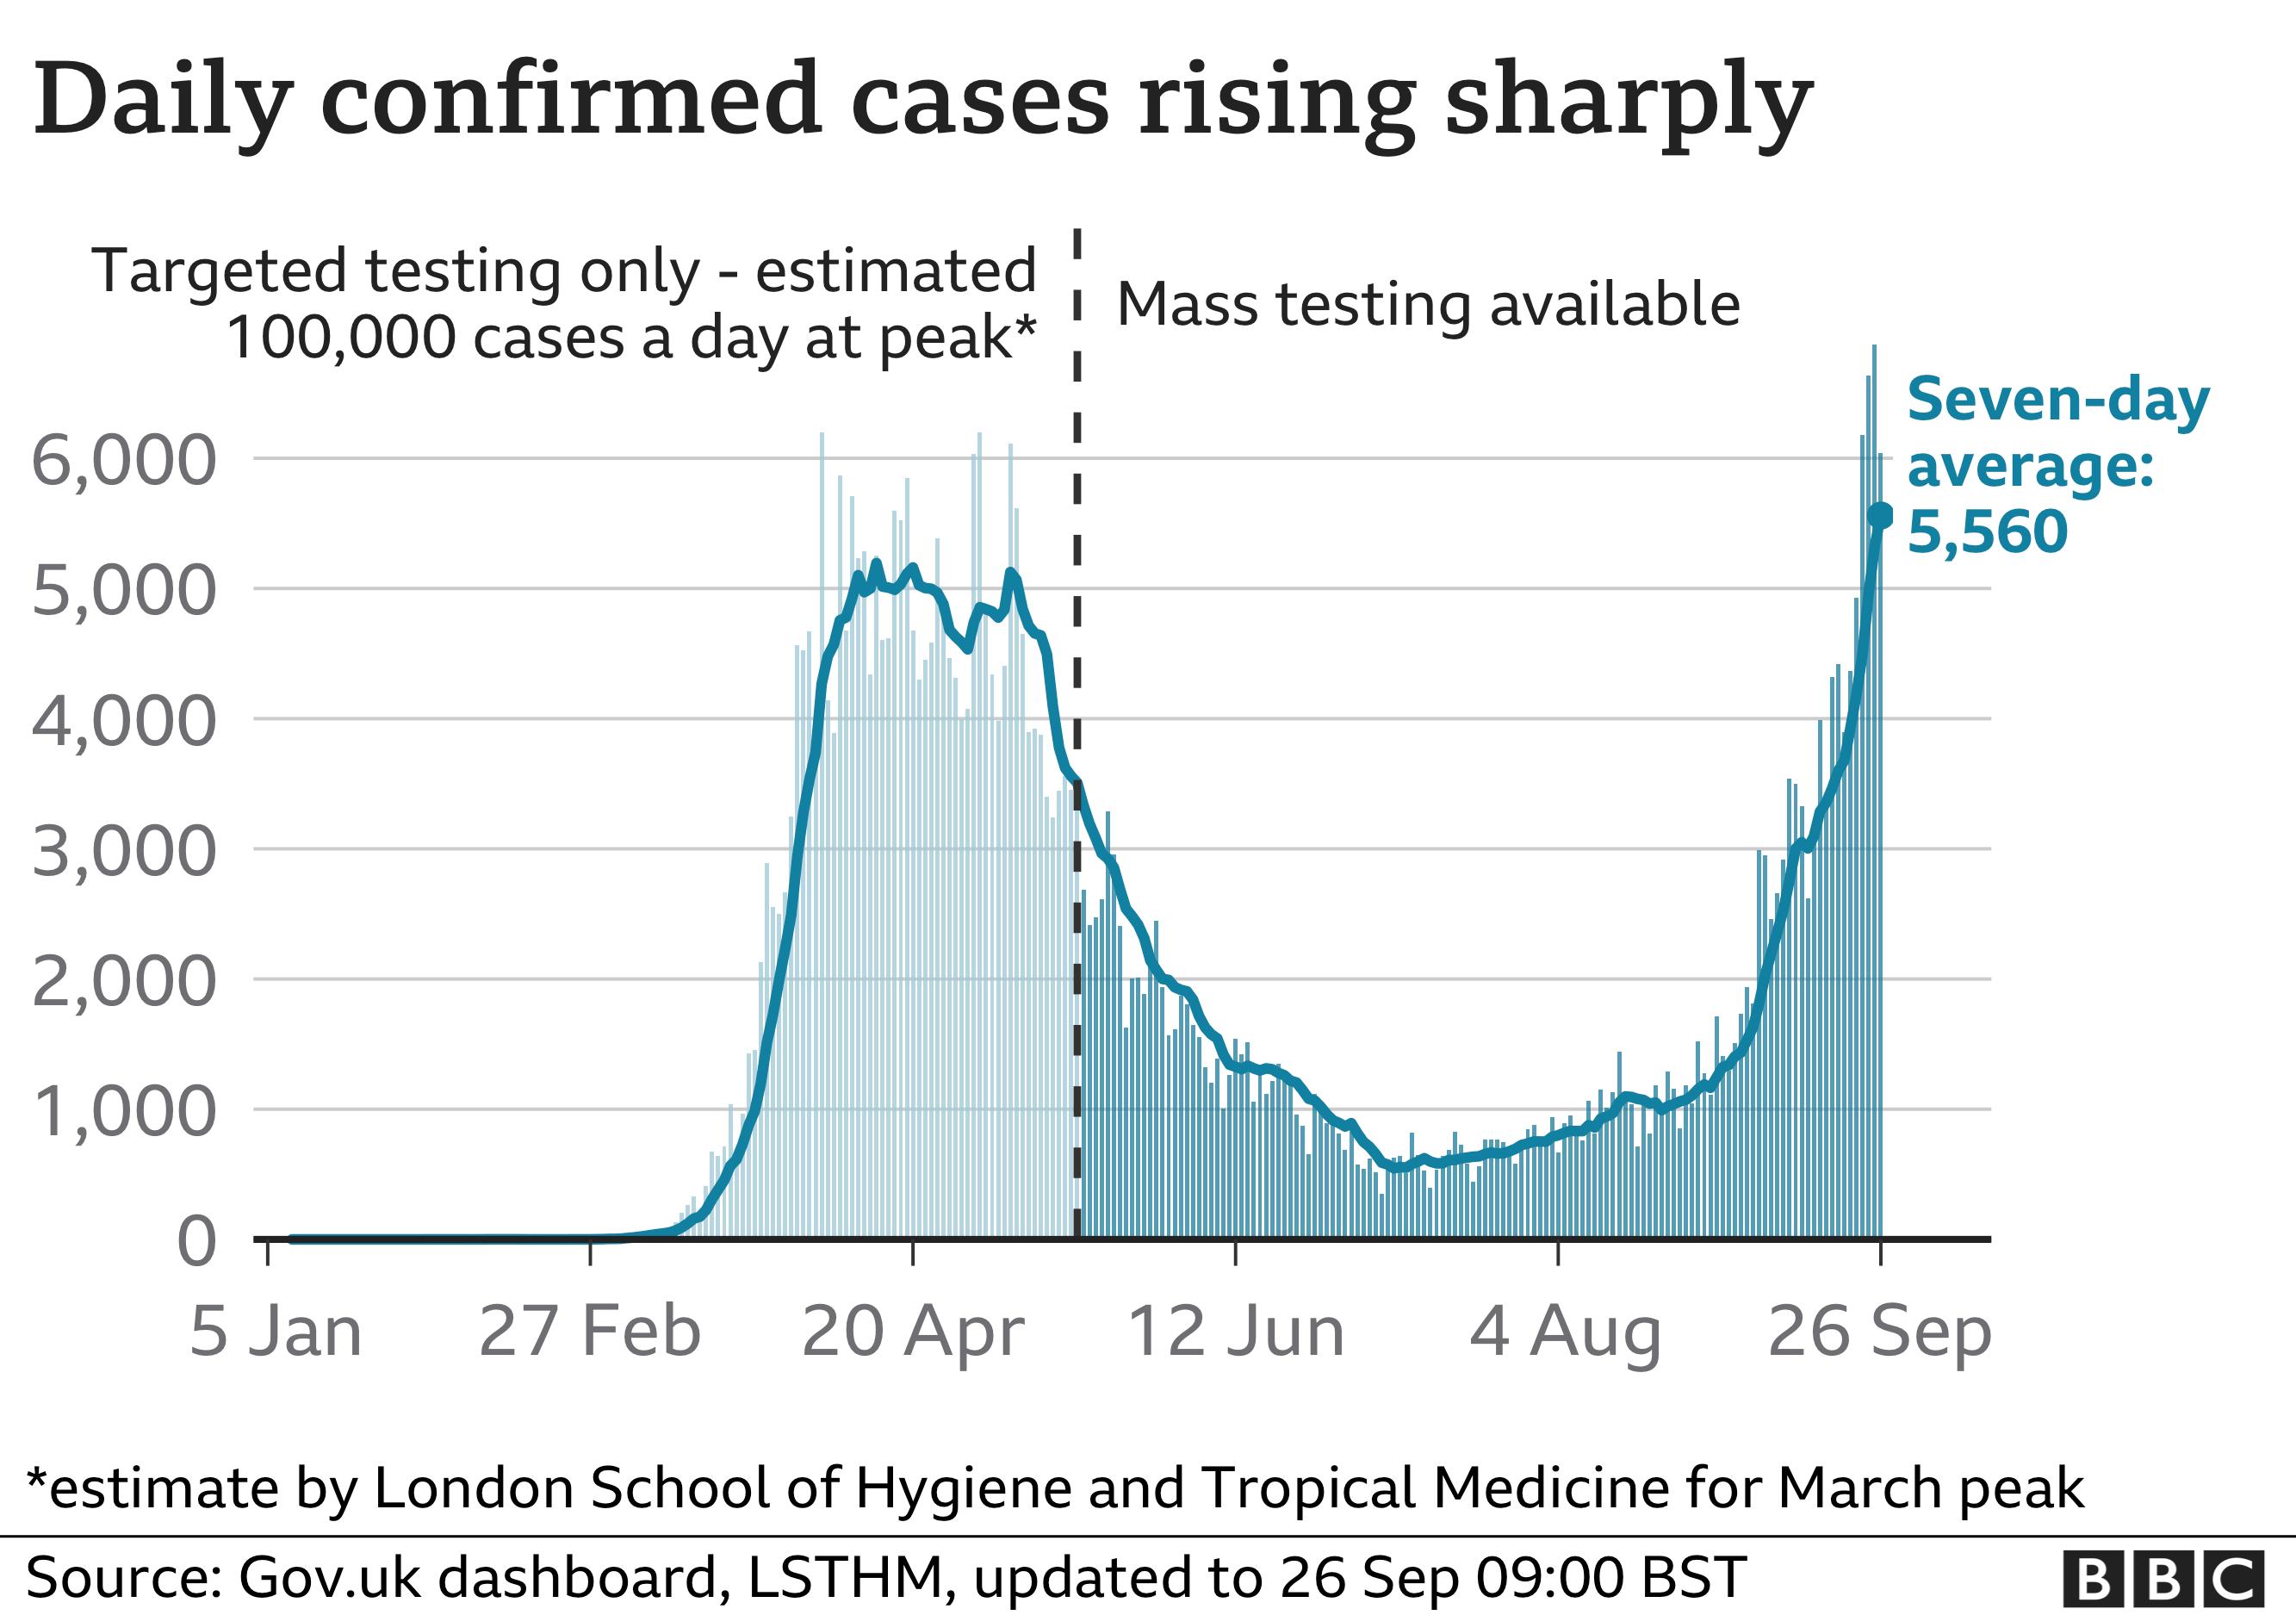 UK confirmed coronavirus cases